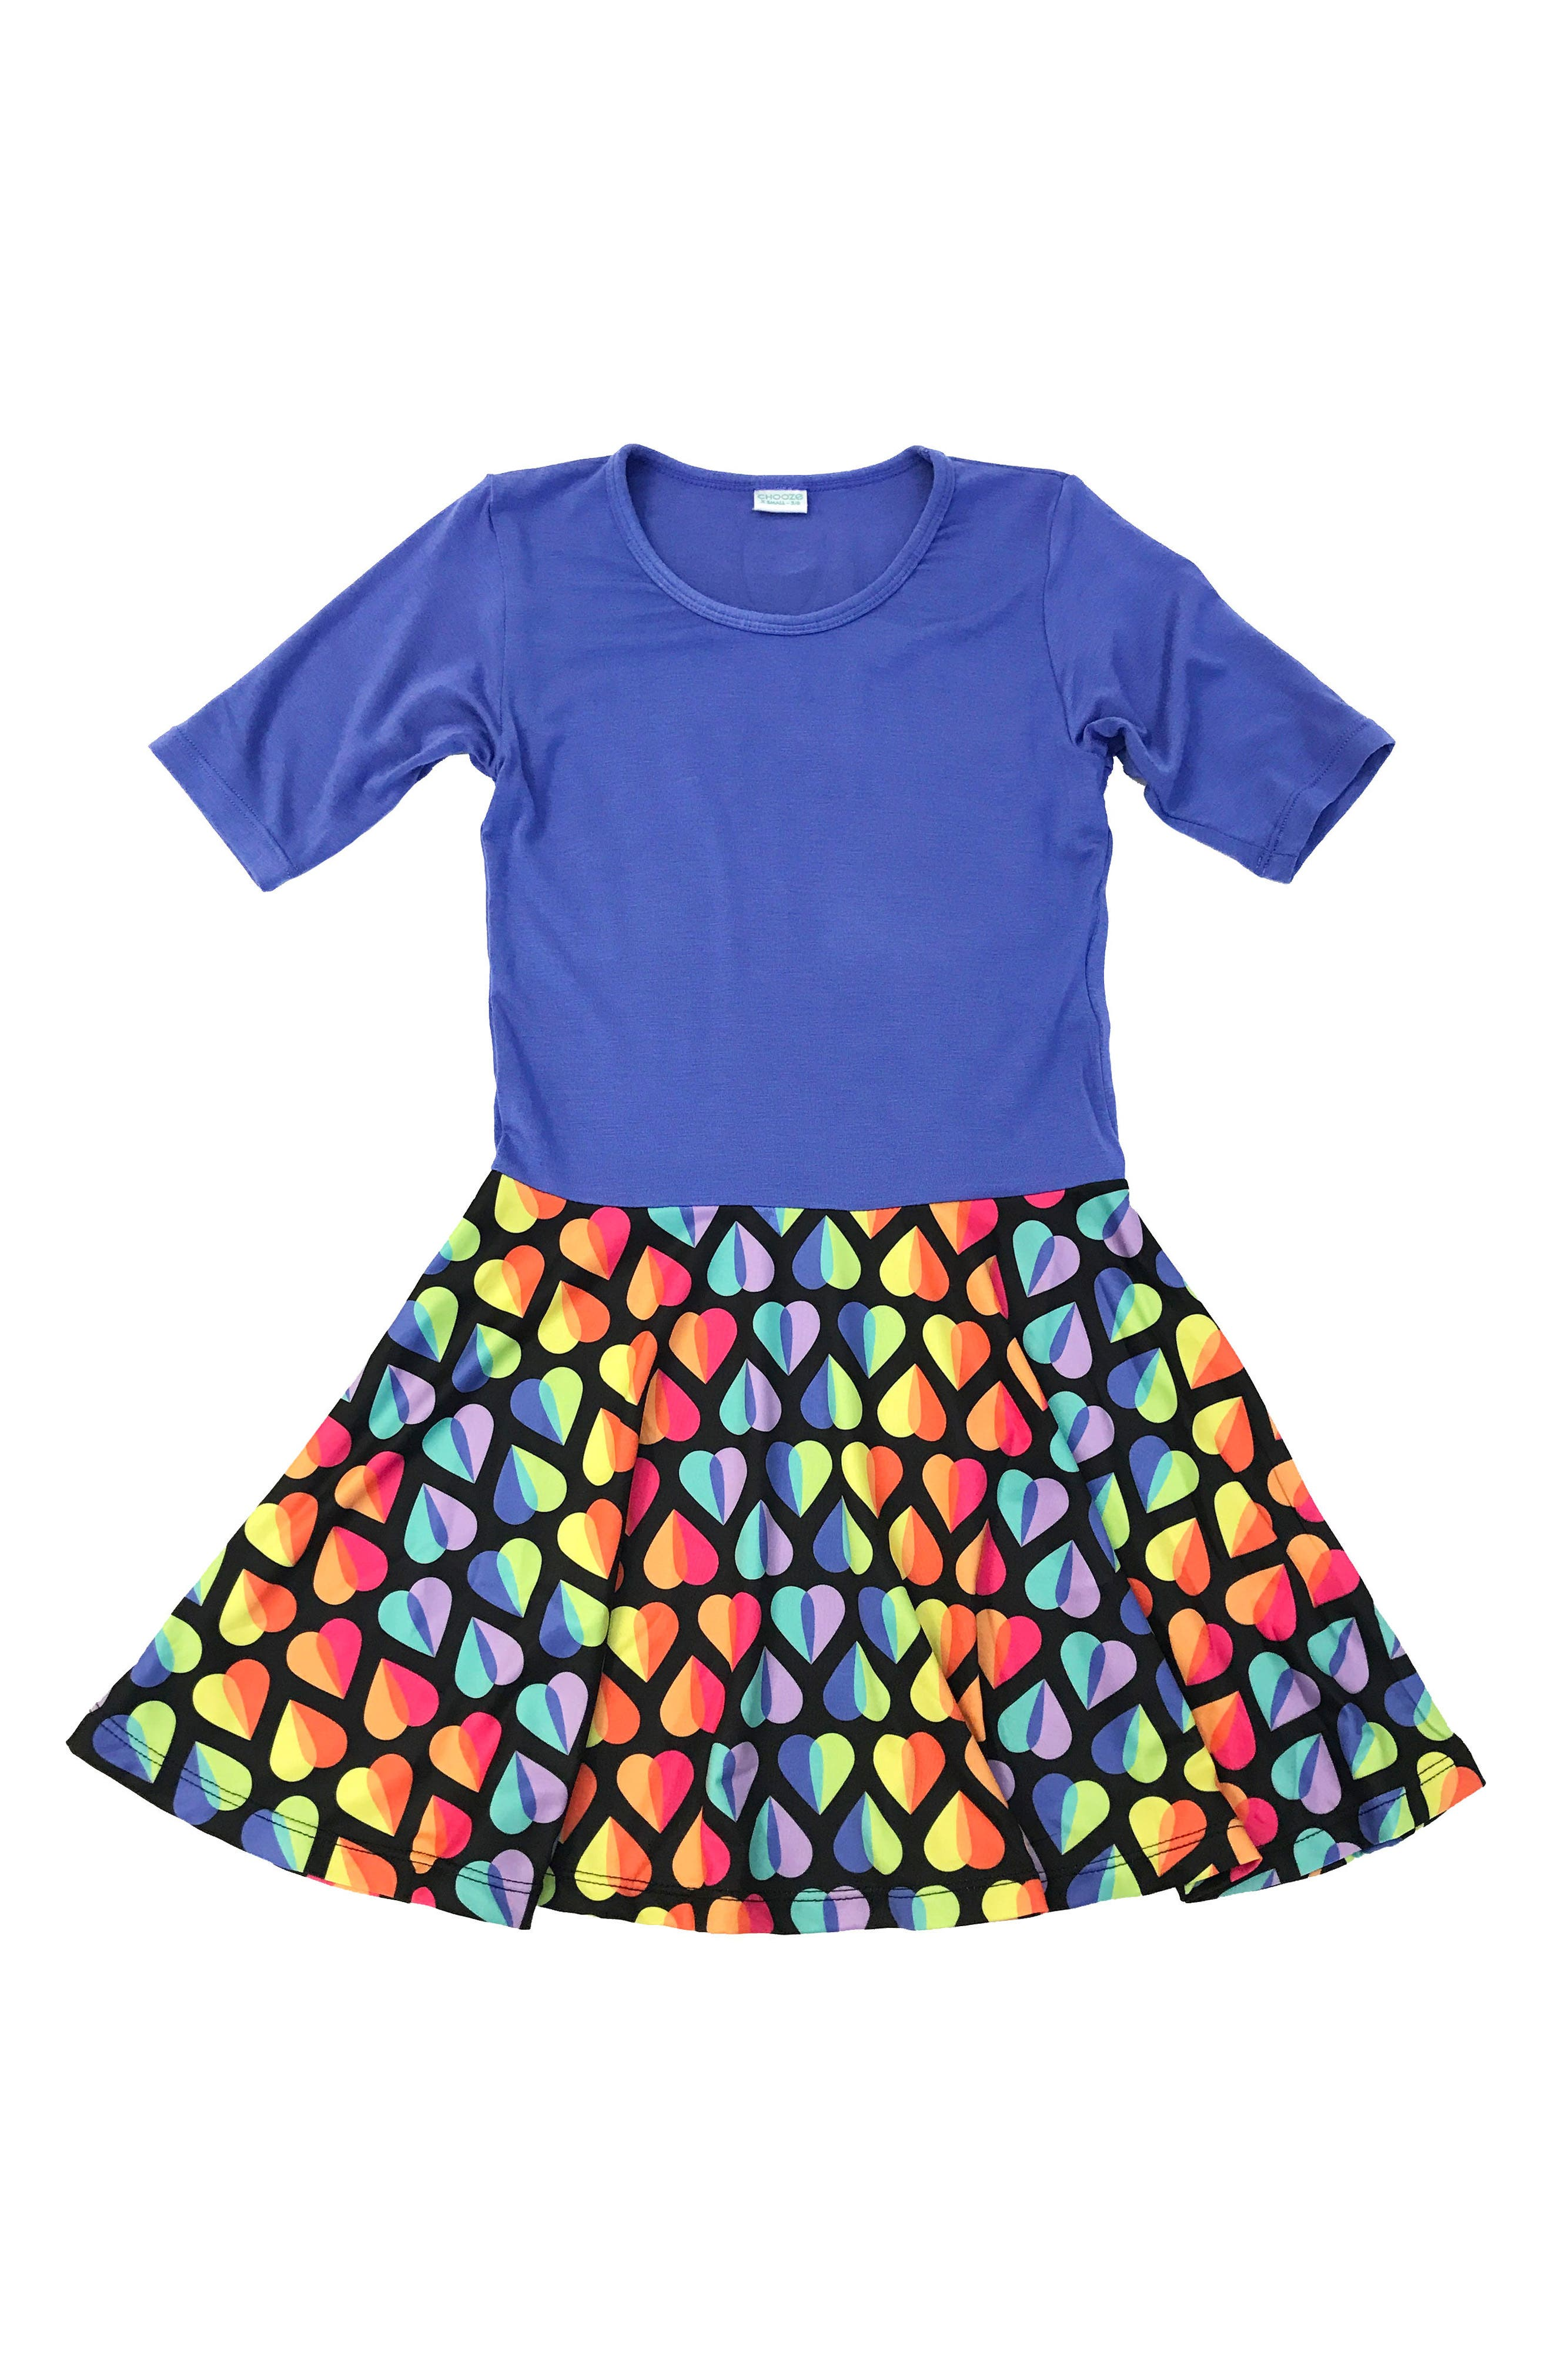 CHOOZE Spree Mixed Print Dress (Little Girls & Big Girls)